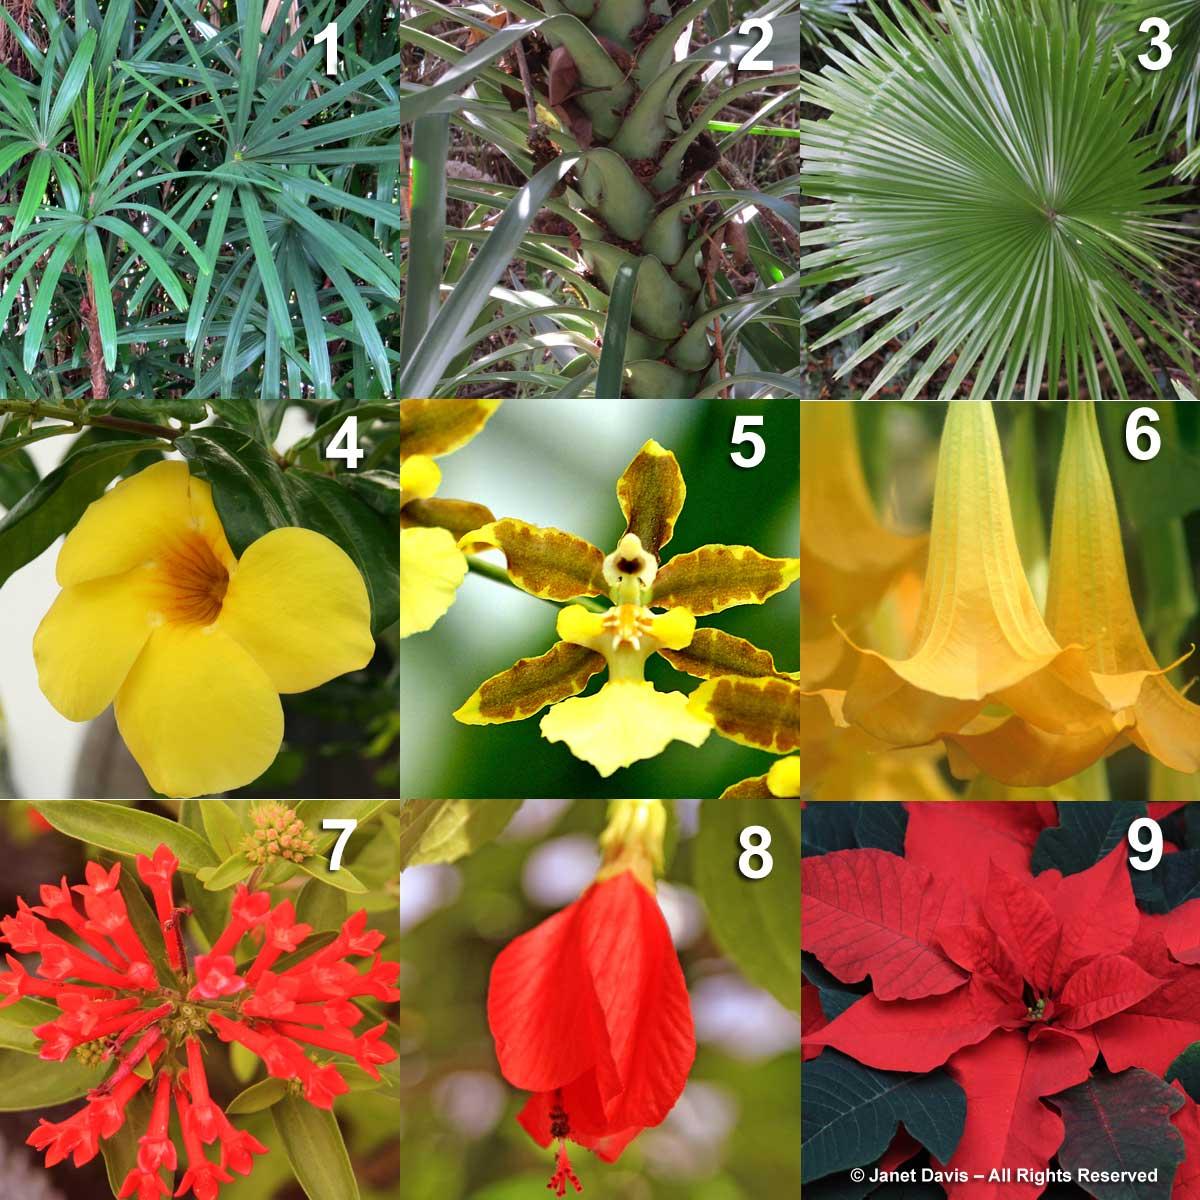 """ BOB MARLEY"" - RBBALEOMY 3. Bouvardia ternifolia 7. Oncidium goldiana 2. Brugmansia aurea 8. Malvaviscus arboreus 4. Allamanda cathartica 1. Rhapis excelsa 5. Licuala spinosa 6. Euphorbia pulcherrima 9. Yucca aloifolia"